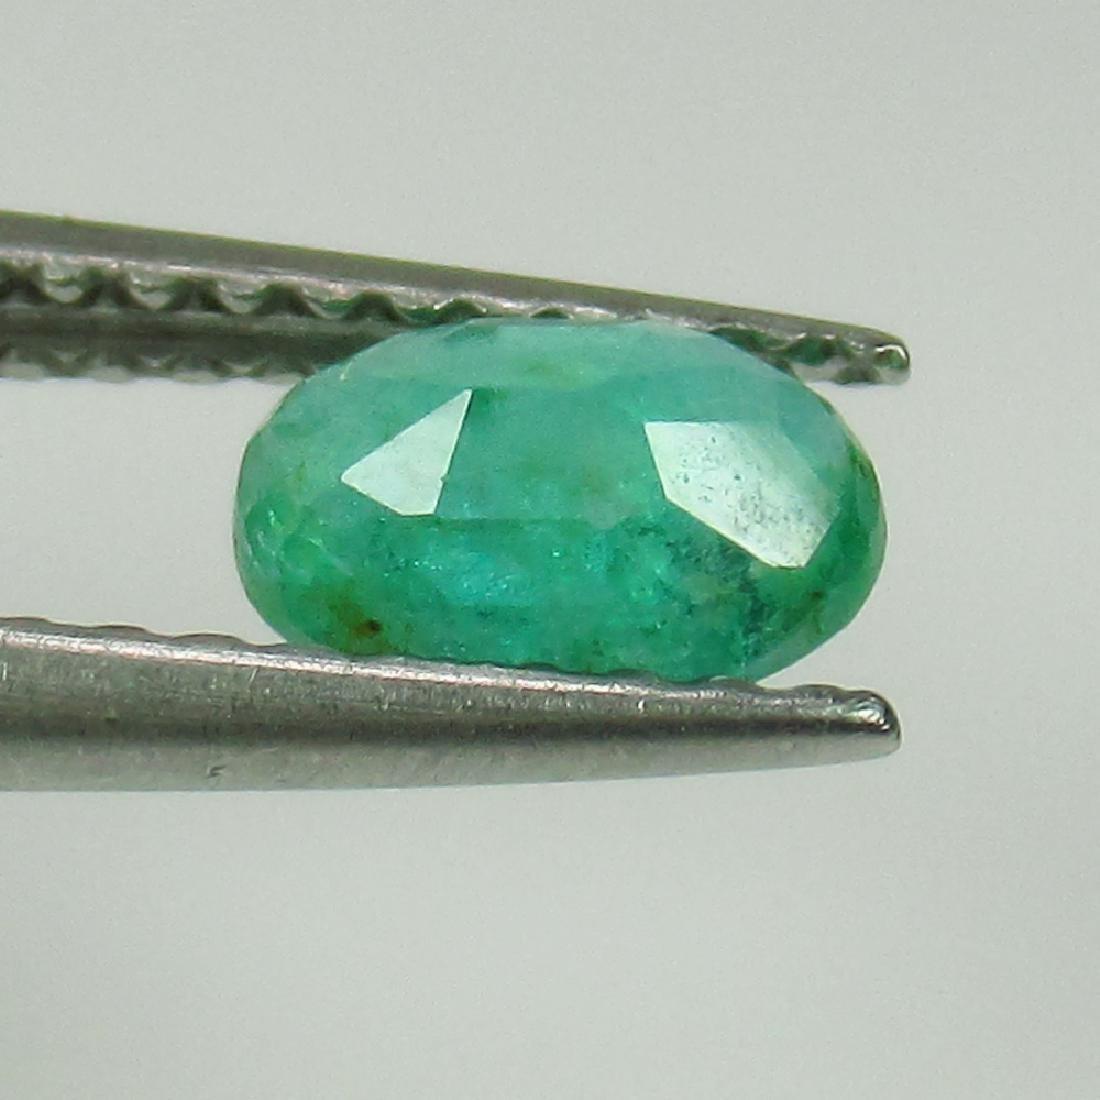 0.48 Ct Genuine Zambian Emerald Nice Oval Cut - 2